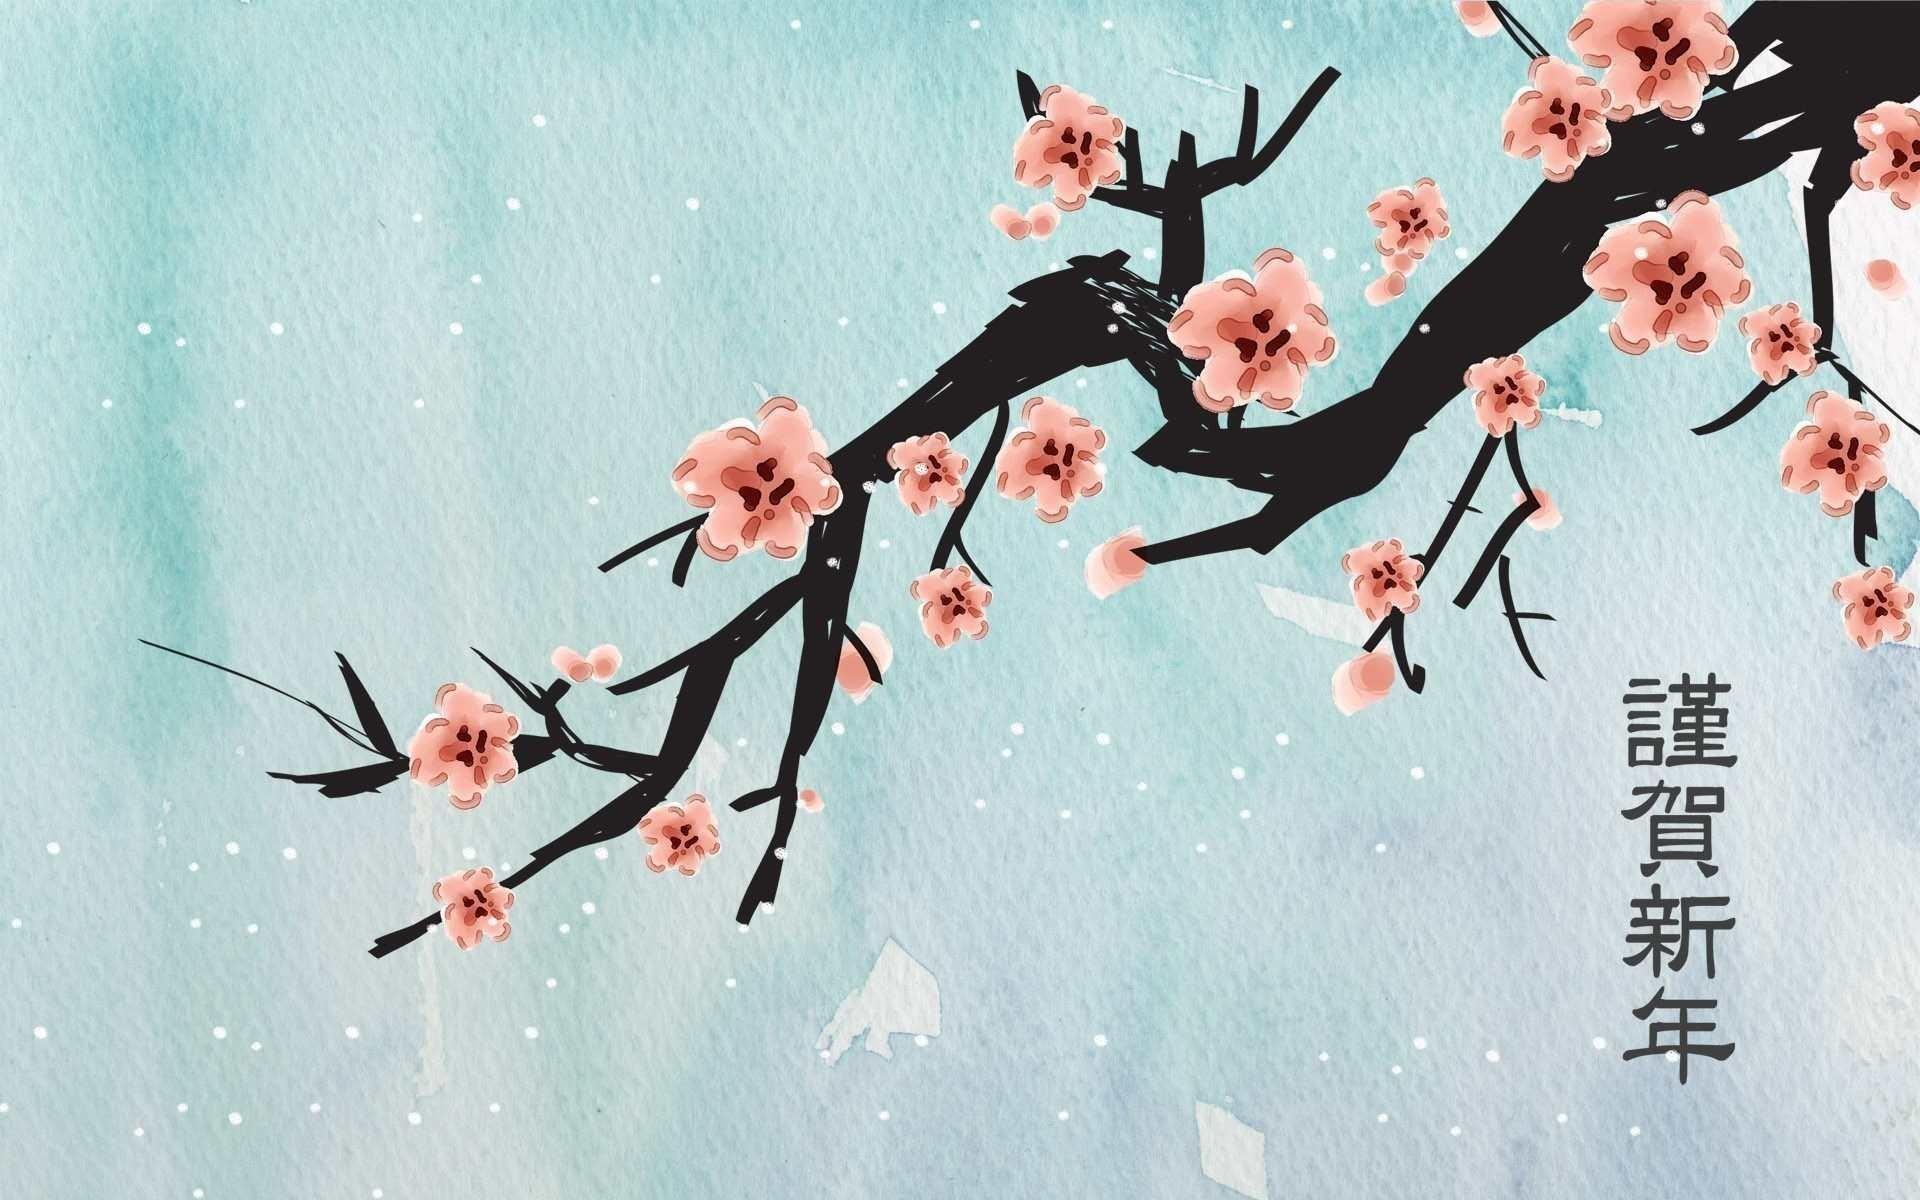 Res: 1920x1200,  Japanese Desktop Backgrounds Wallpaper 1920×1200 Wallpapers  Japanese (43 Wallpapers) | Adorable